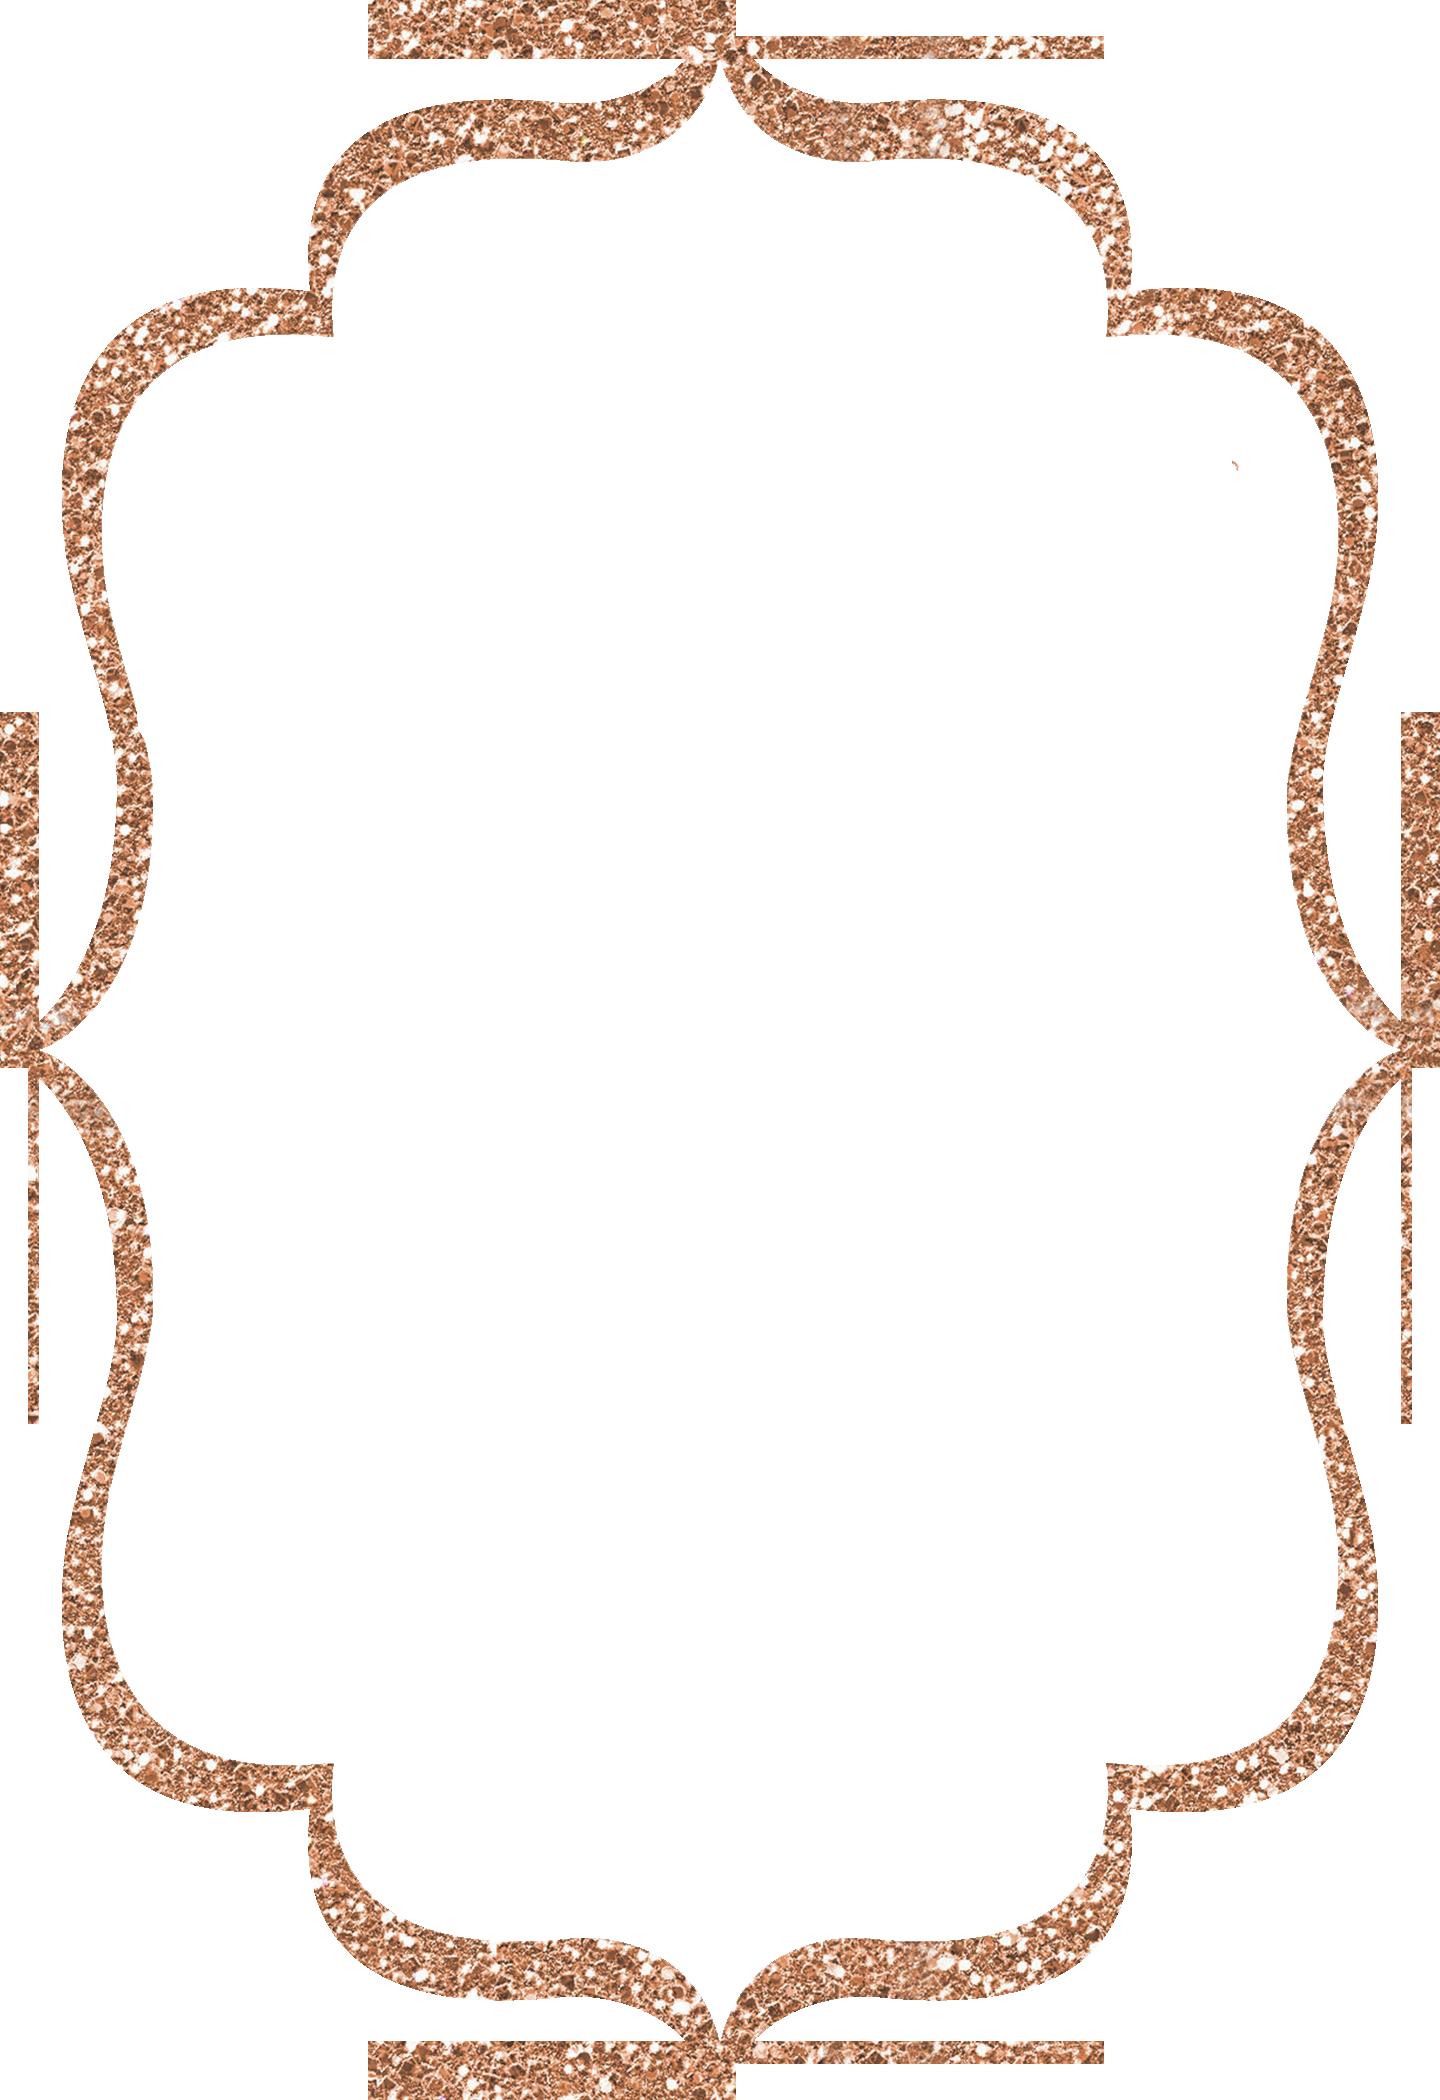 Design printabell create home. Planner clipart transparent